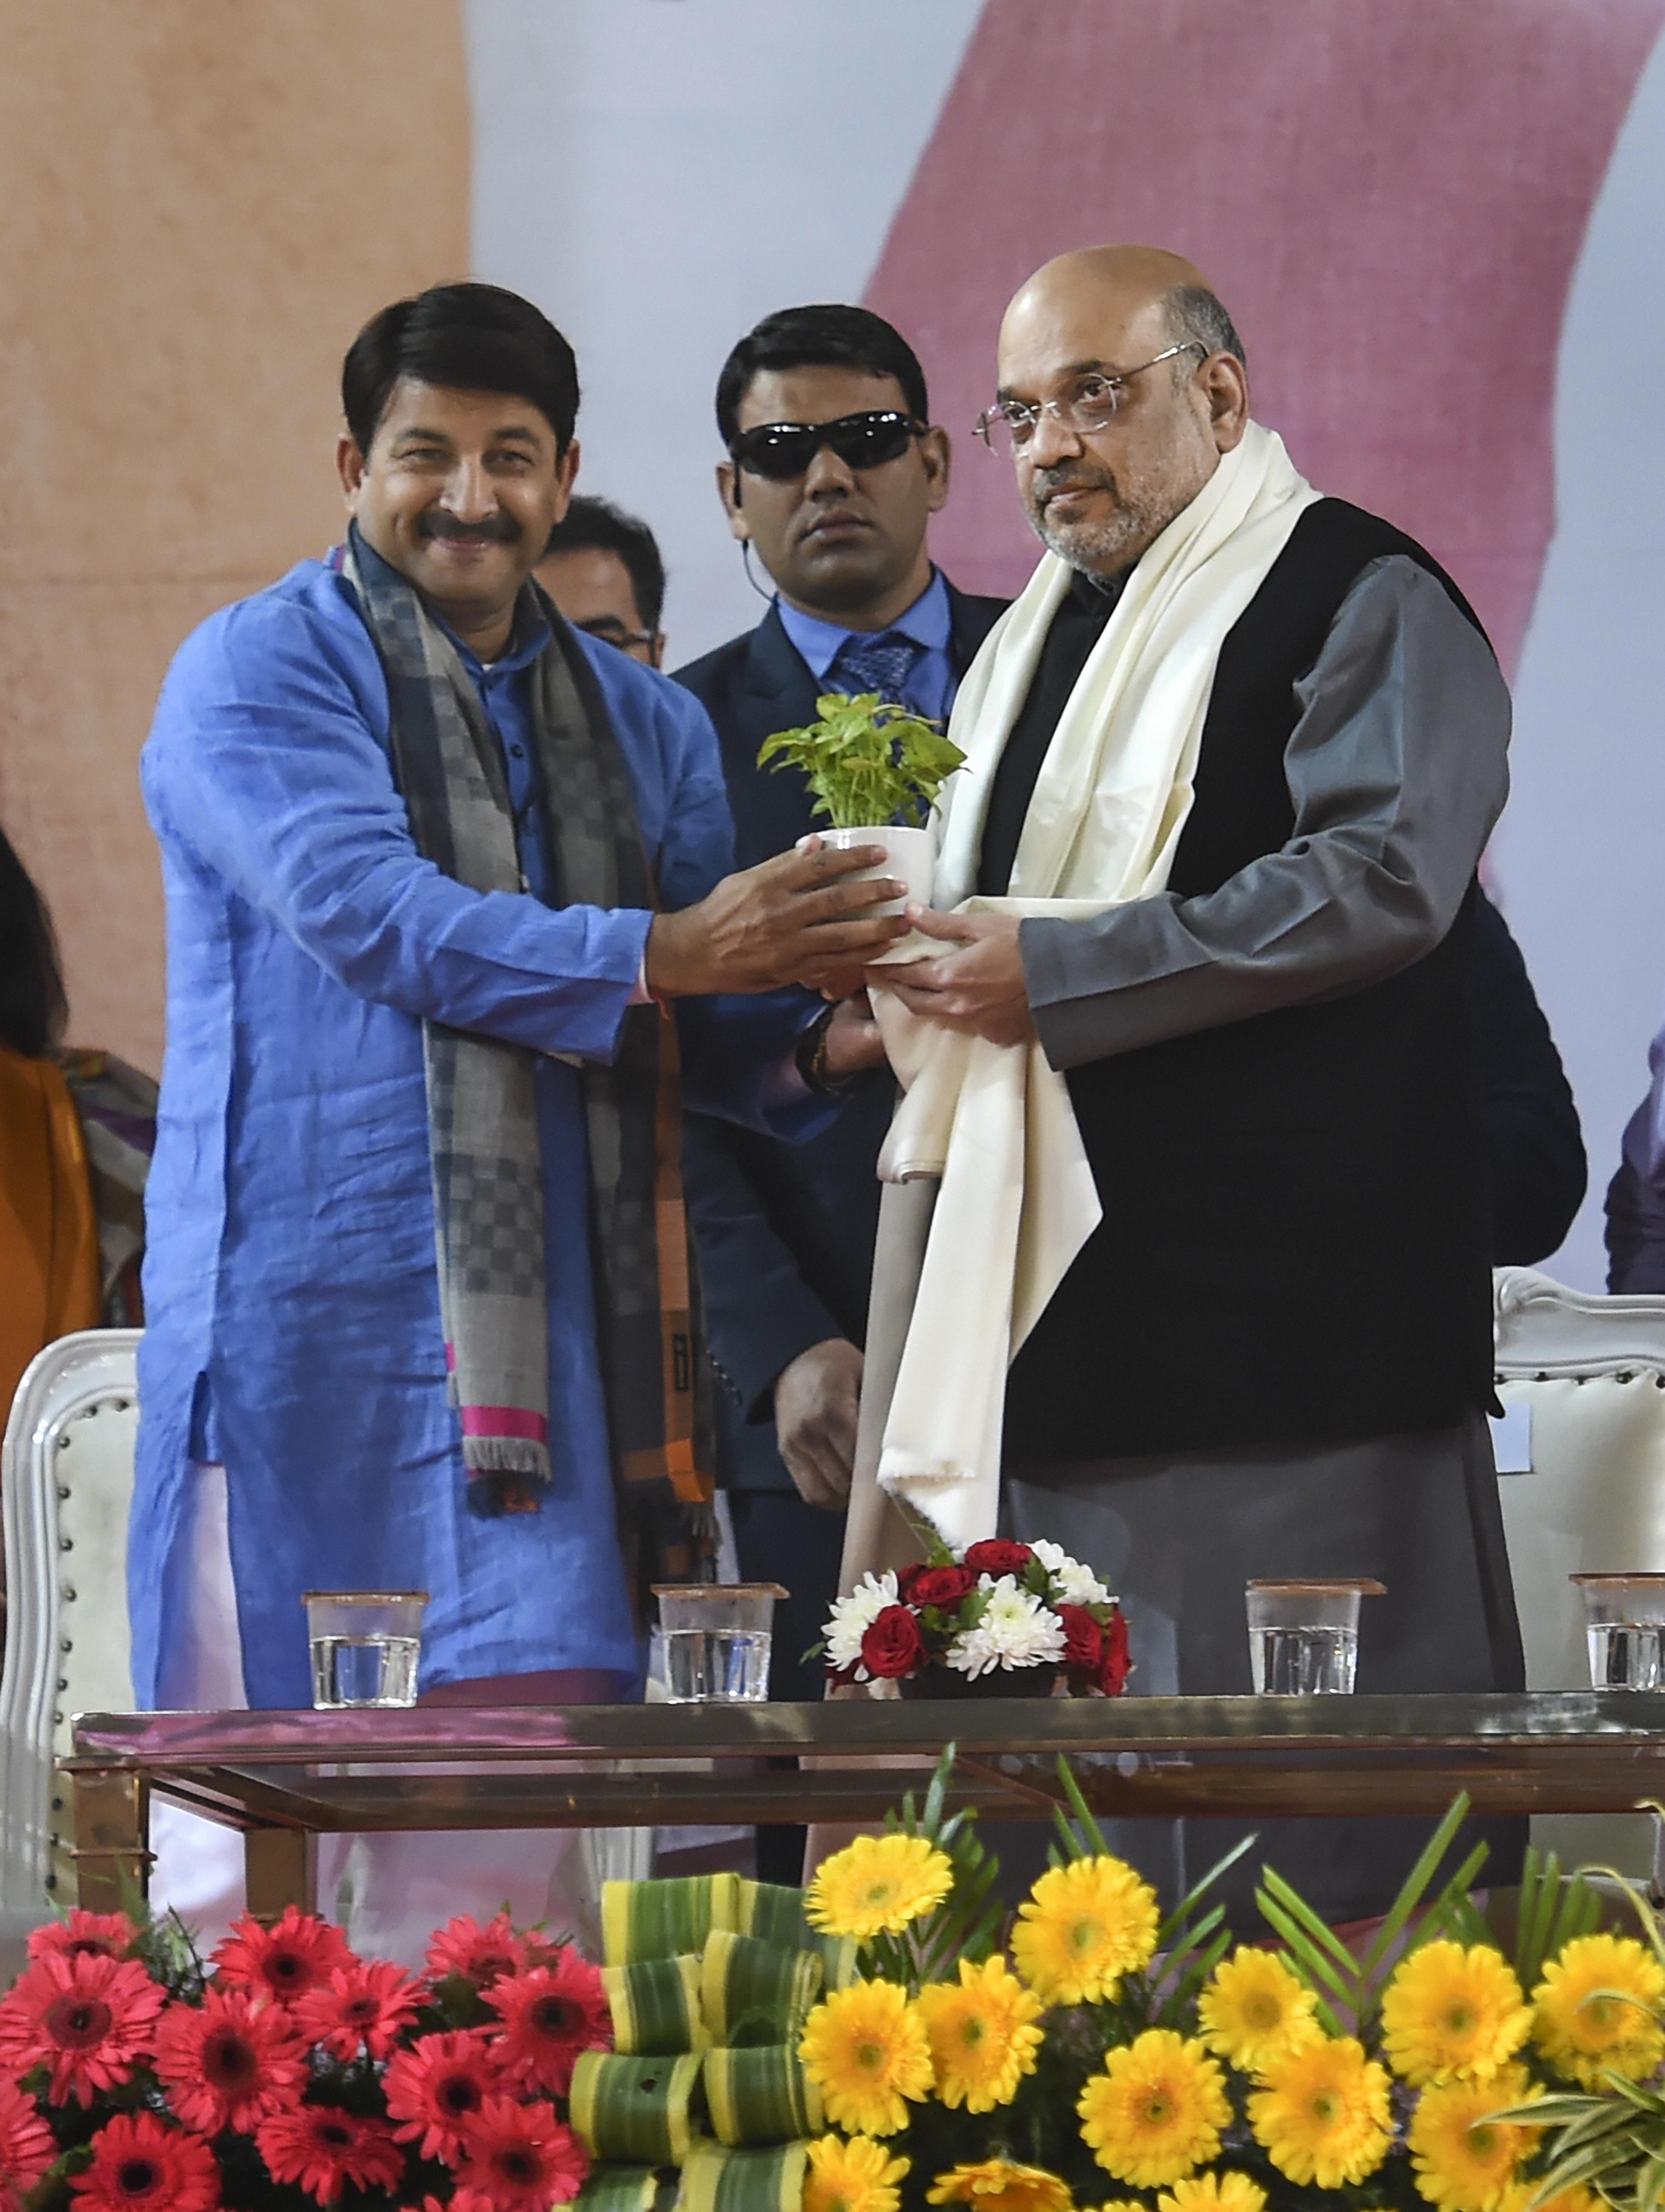 Union home minister Amit Shah being presented a sapling by Delhi BJP president Manoj Tiwari during BJP's booth-level workers' rally 'Delhi Karyakarta Samelan' in New Delhi, Sunday, January 5, 2020.